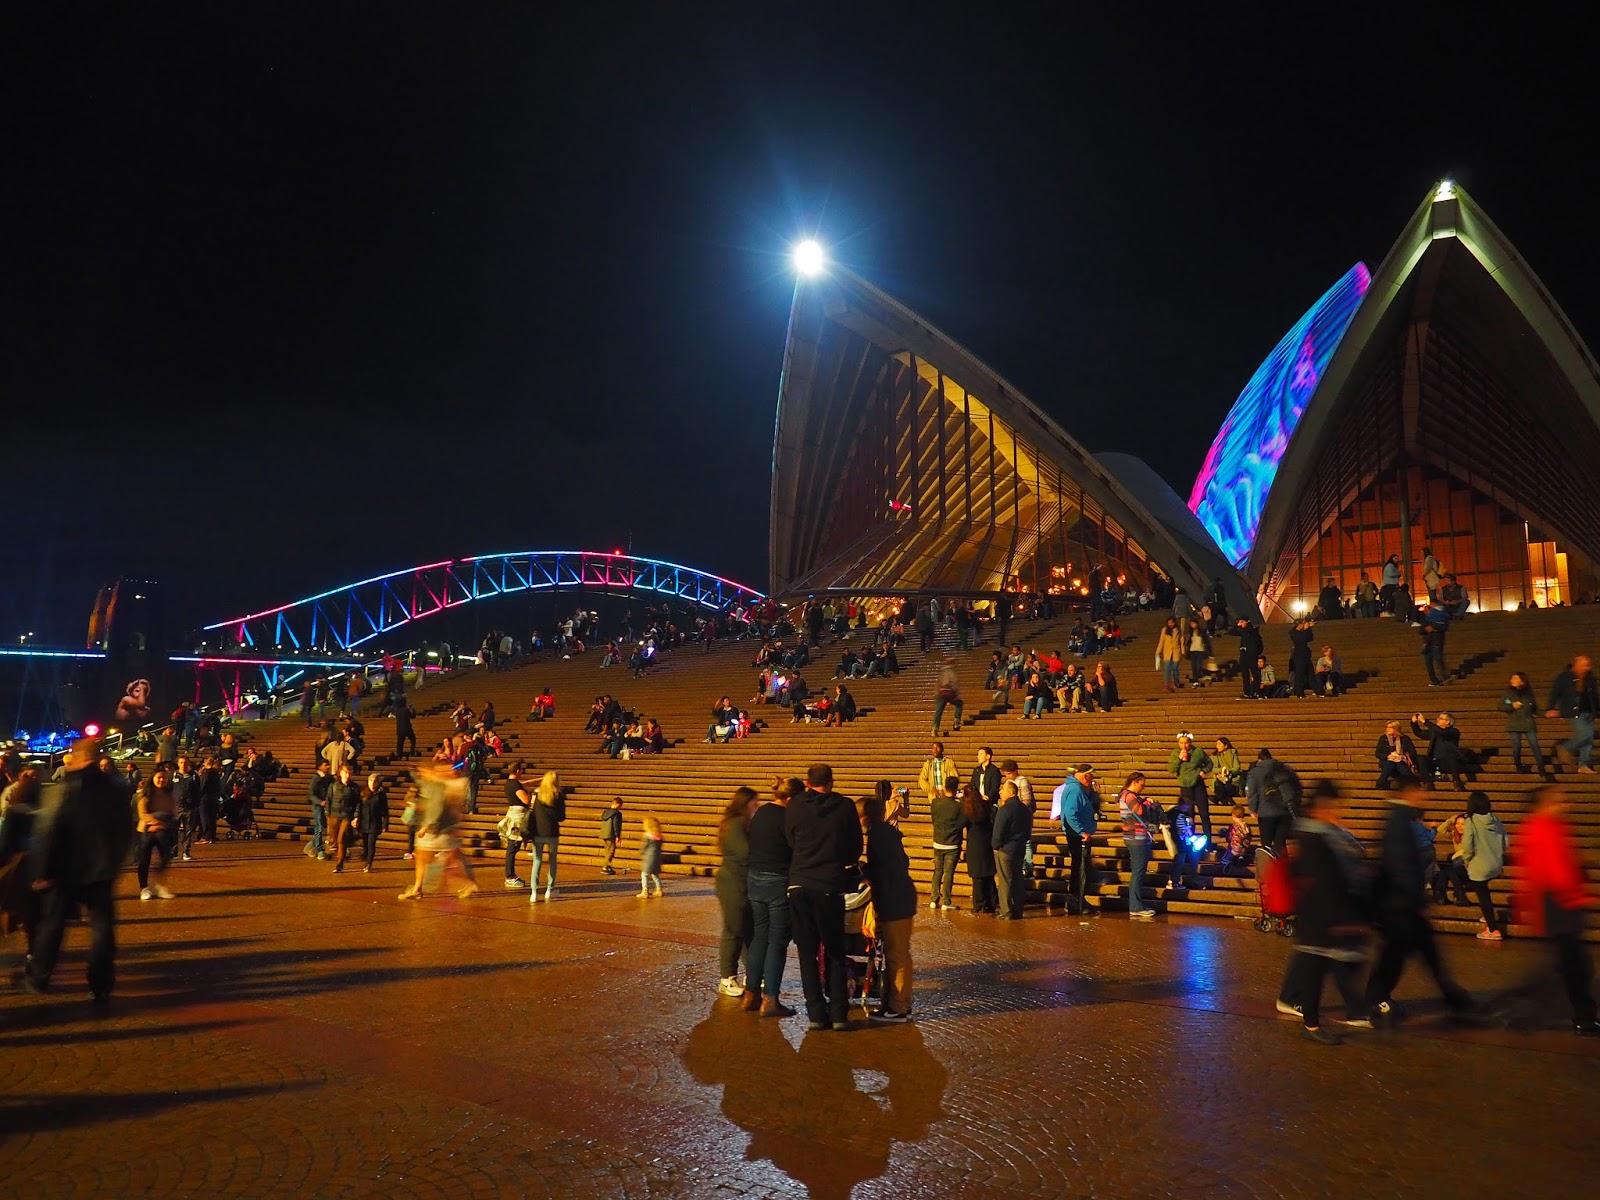 Vivid Sydney Opera House and Harbour Bridge